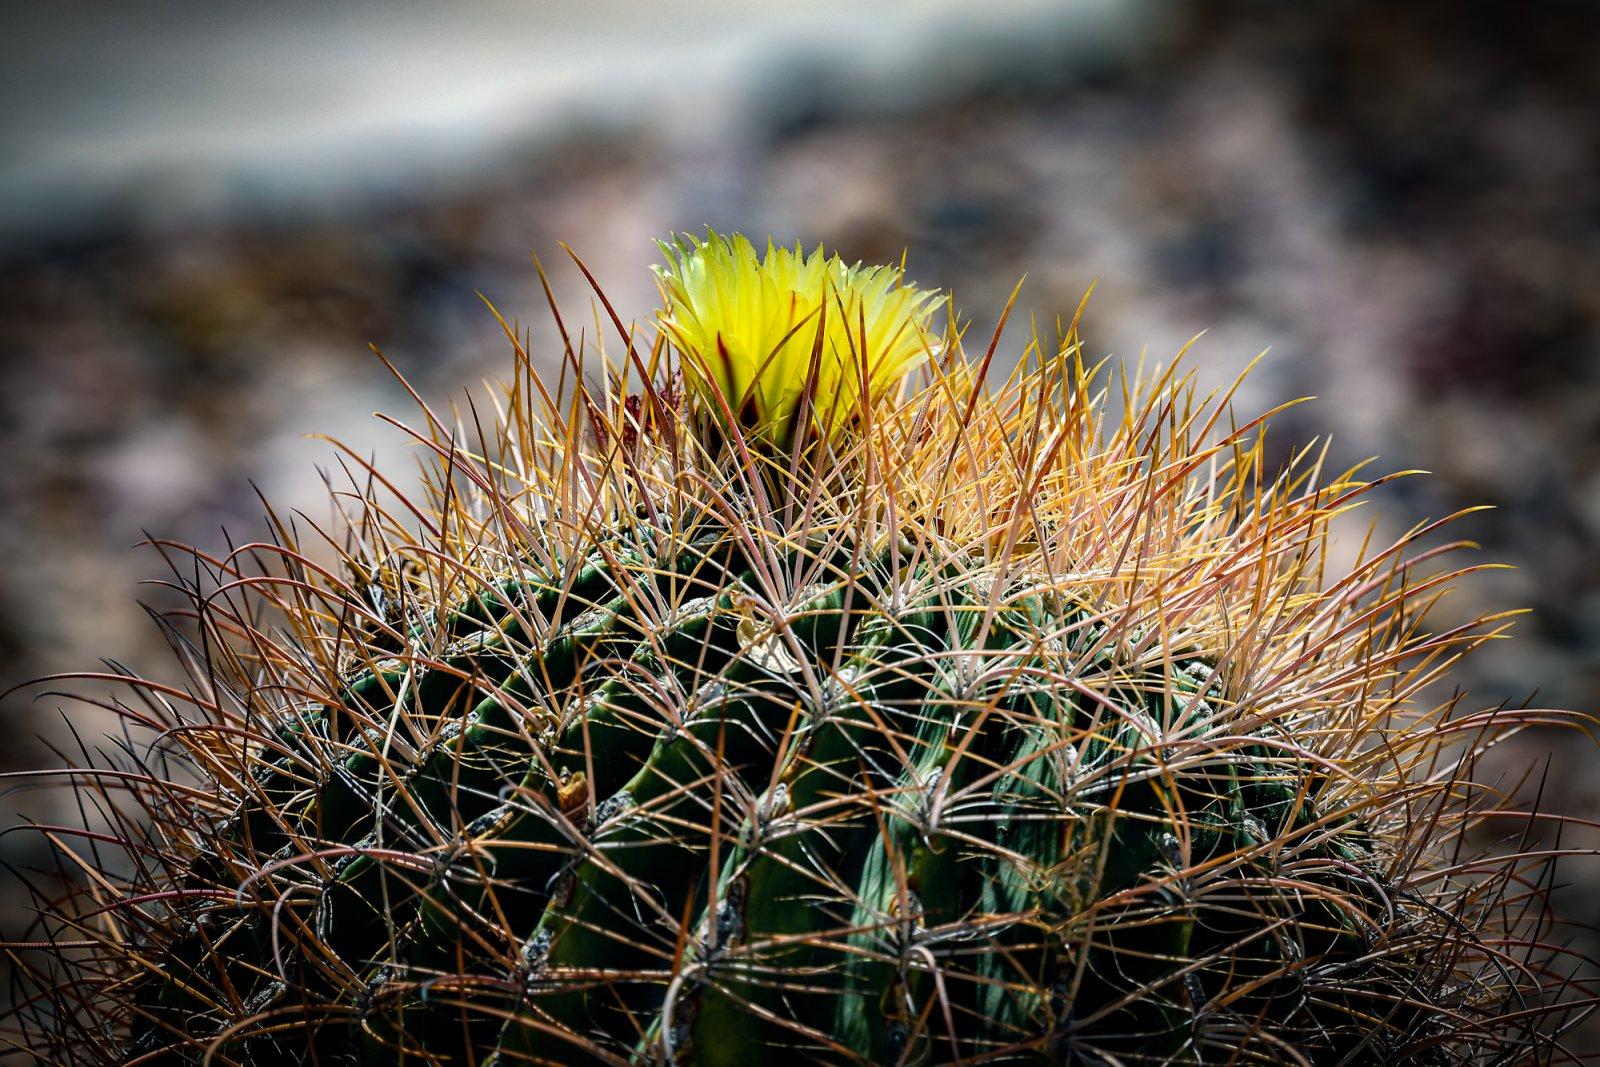 Cactus Flower small-4.jpg